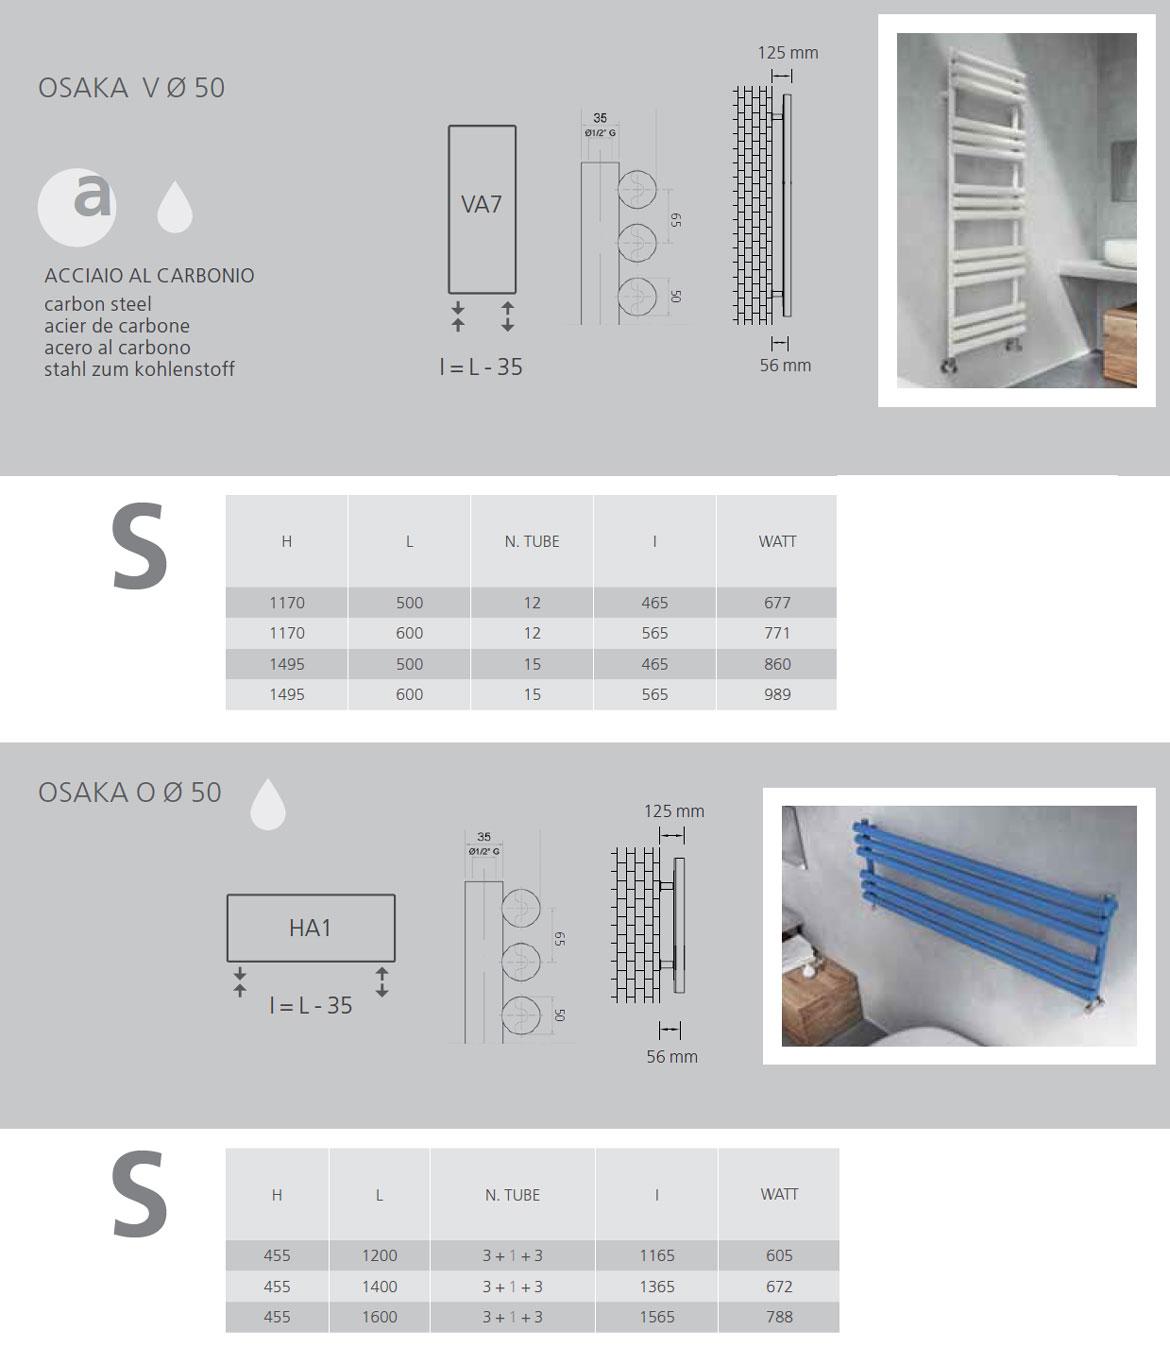 fiche-technique-seche-serviettes-graziano-radiators-osaka-2019